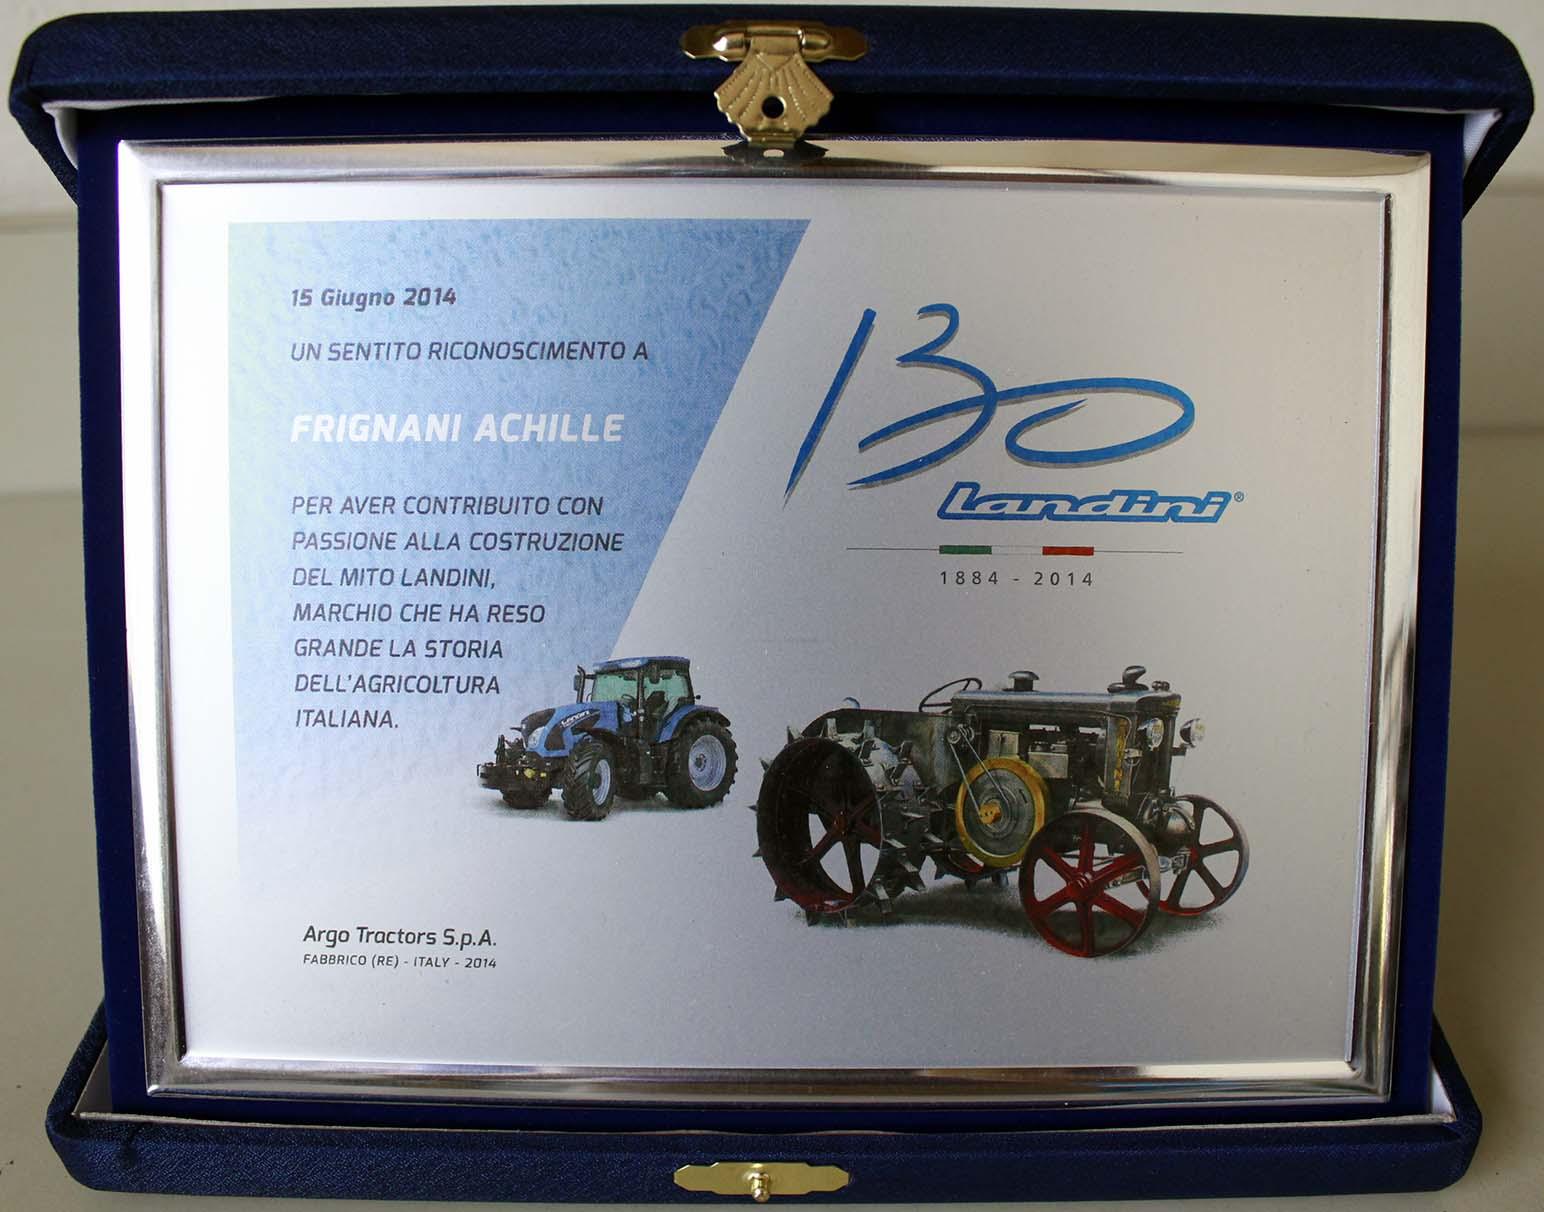 Riconoscimento Landini Argo Tractors